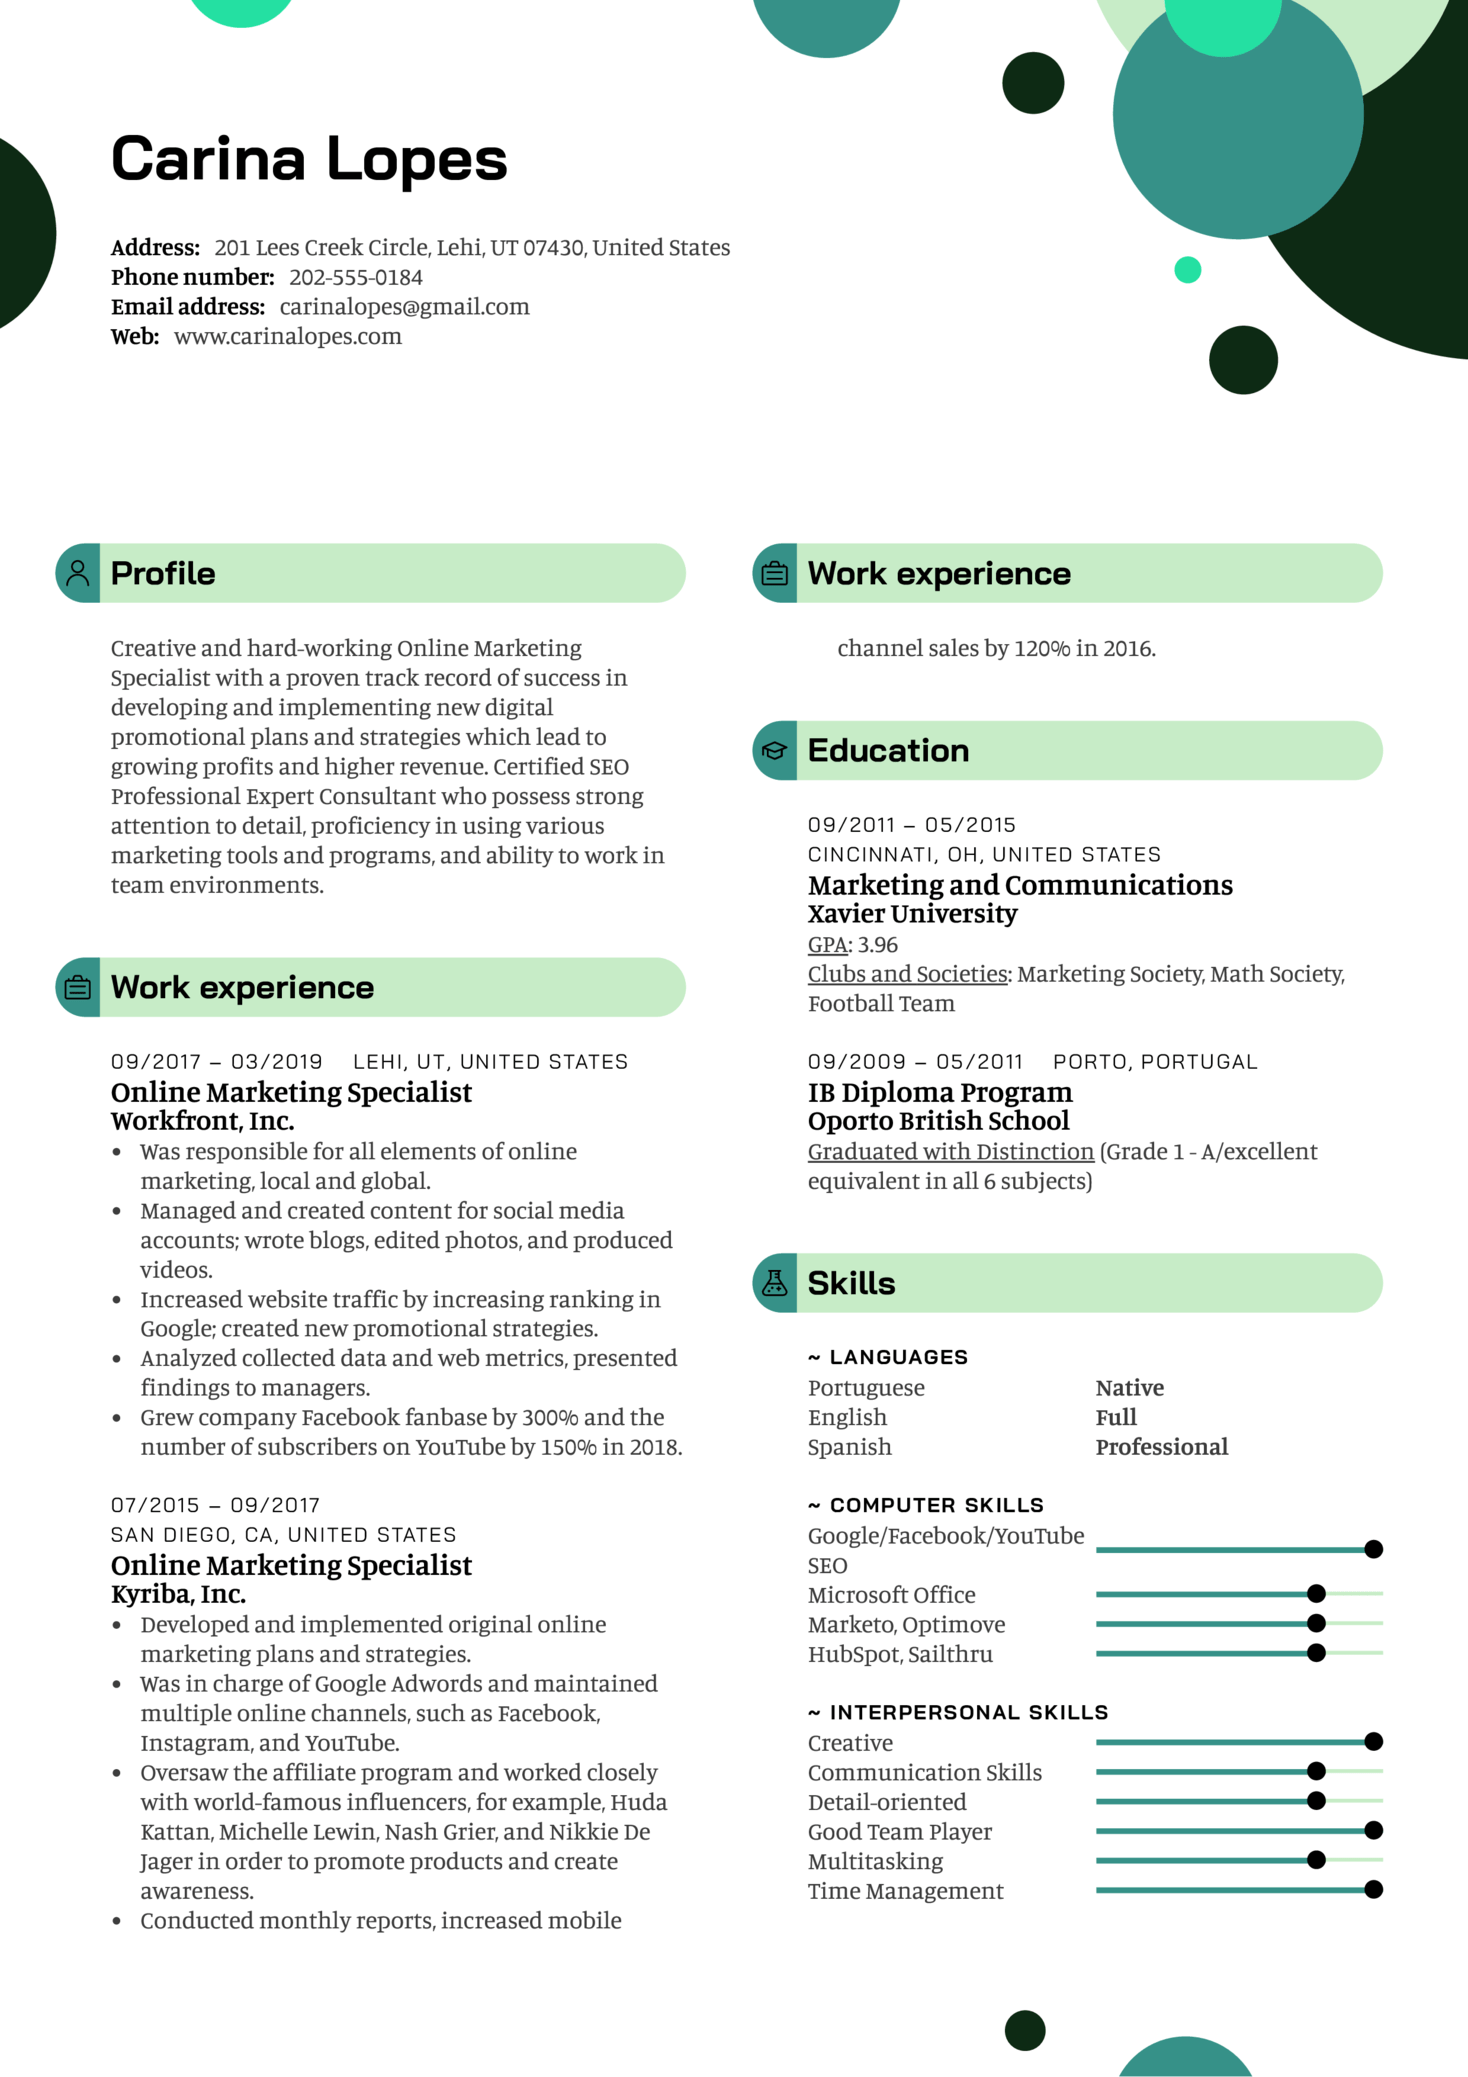 Online Marketing Specialist Resume Template (Teil 1)